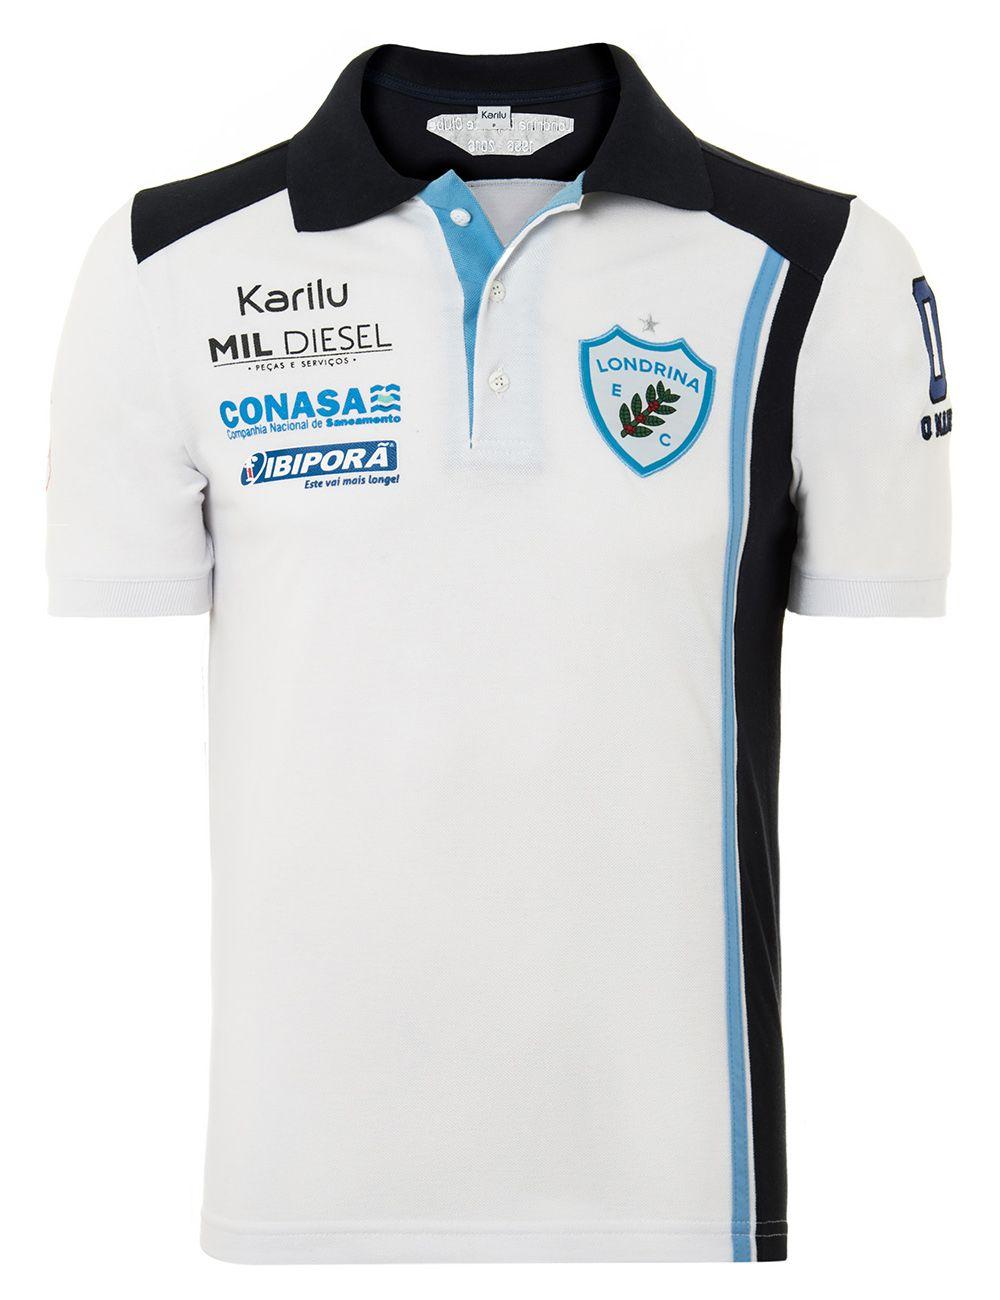 Camisa polo Londrina FÓRMULA TRUCK na Karilu 0847fc13c3aad